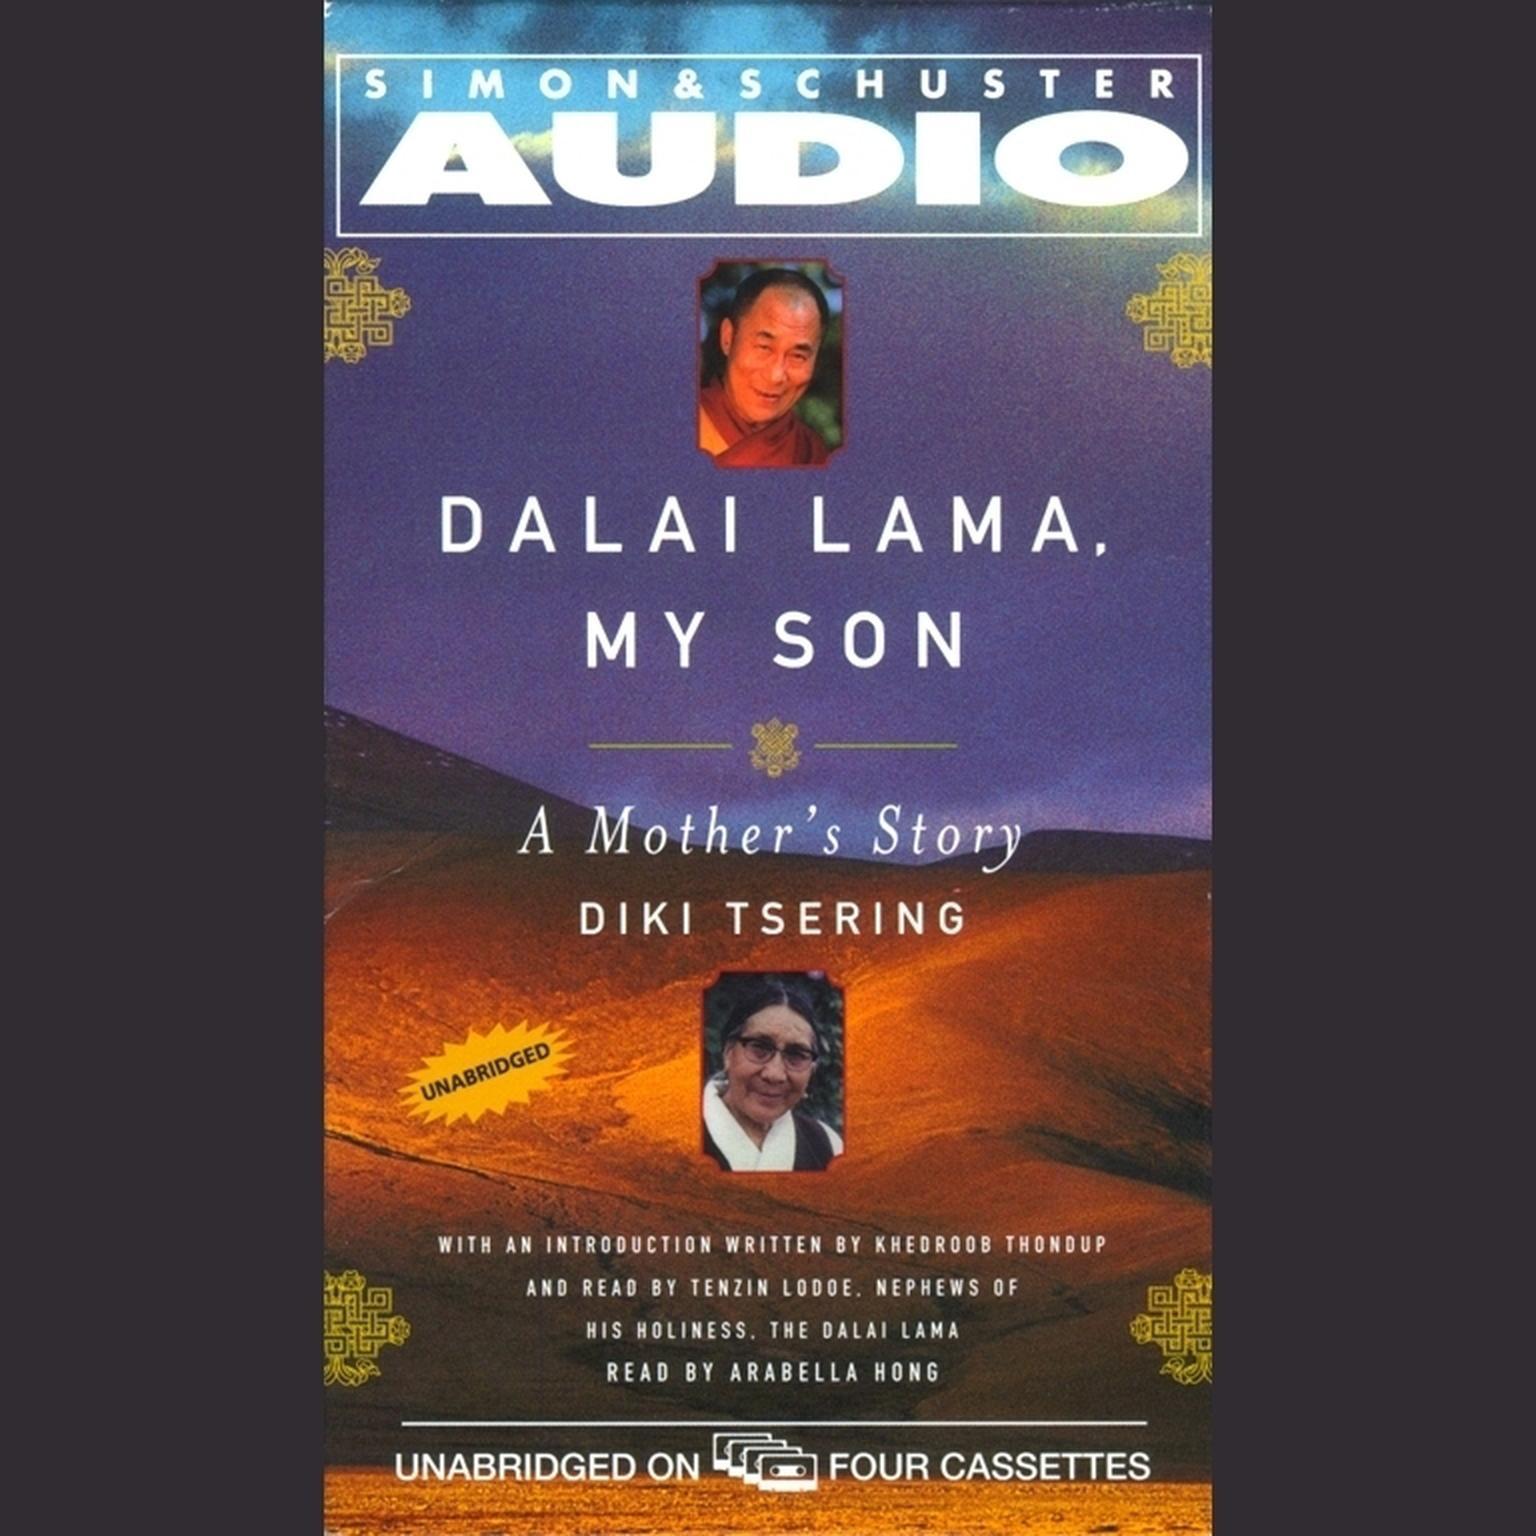 Dalai Lama: My Son Audiobook, by Diki Tsering